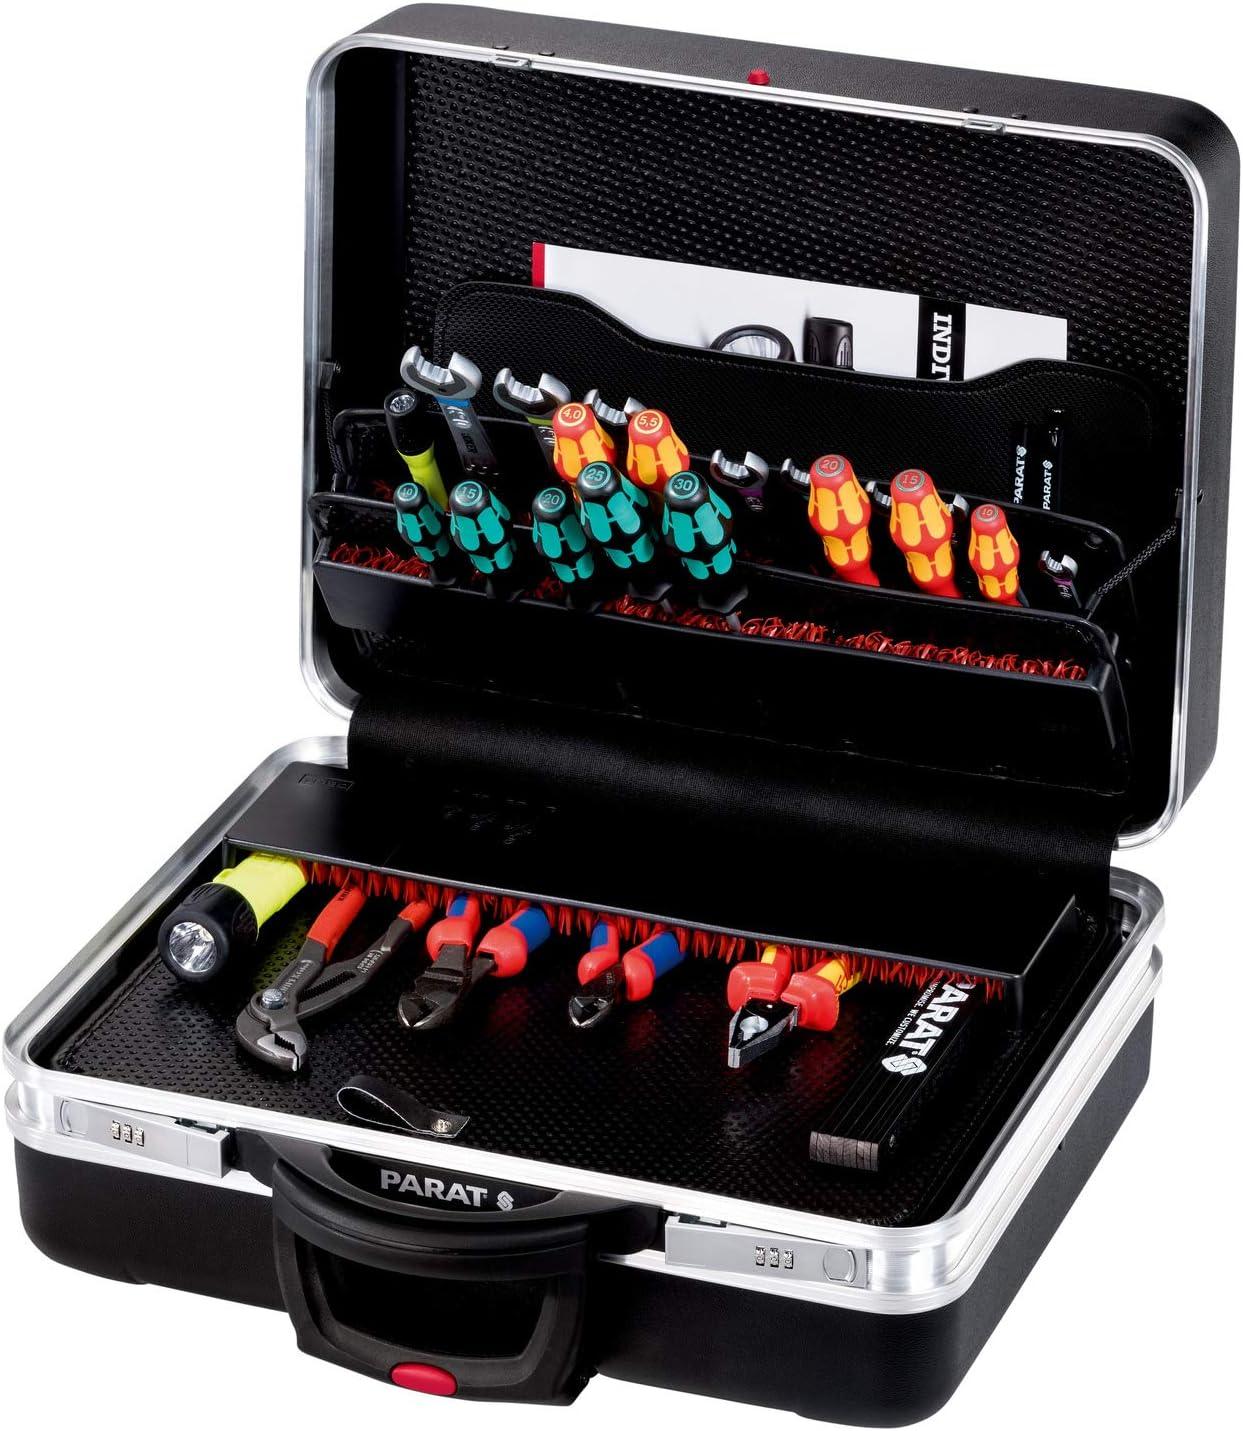 Parat 589550171 caja de herramientas Negro Aluminio, De plástico - Cajas de herramientas (Negro, Aluminio, De plástico, Moisture-resistant, Resistente a golpes, 490 mm, 250 mm, 460 mm)